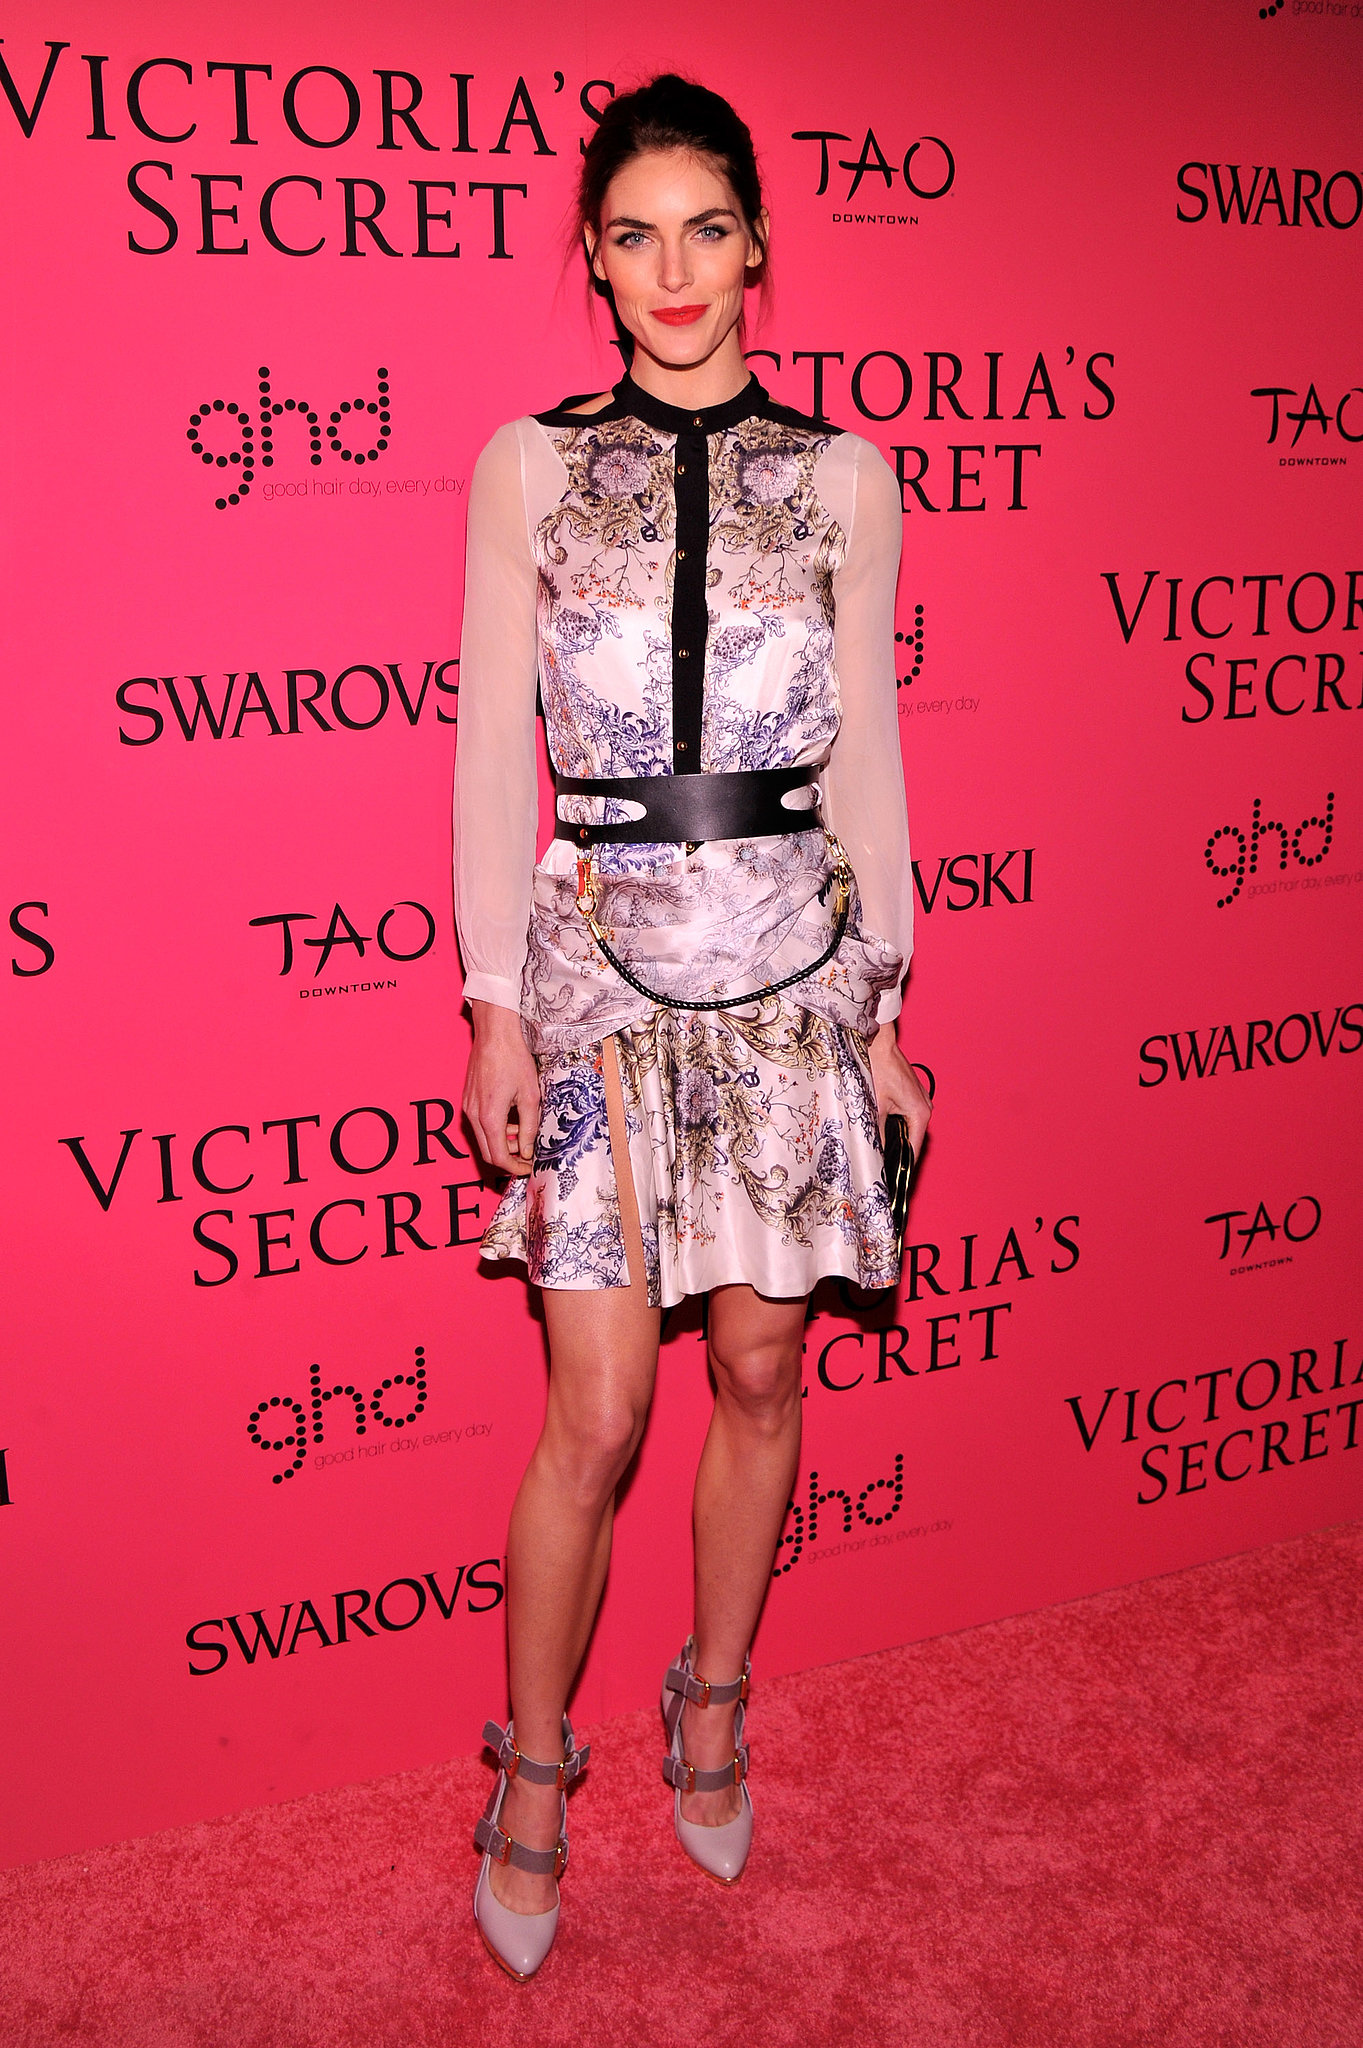 Hilary Rhoda in Prabal Gurung at the Victoria's Secret Fashion Show.